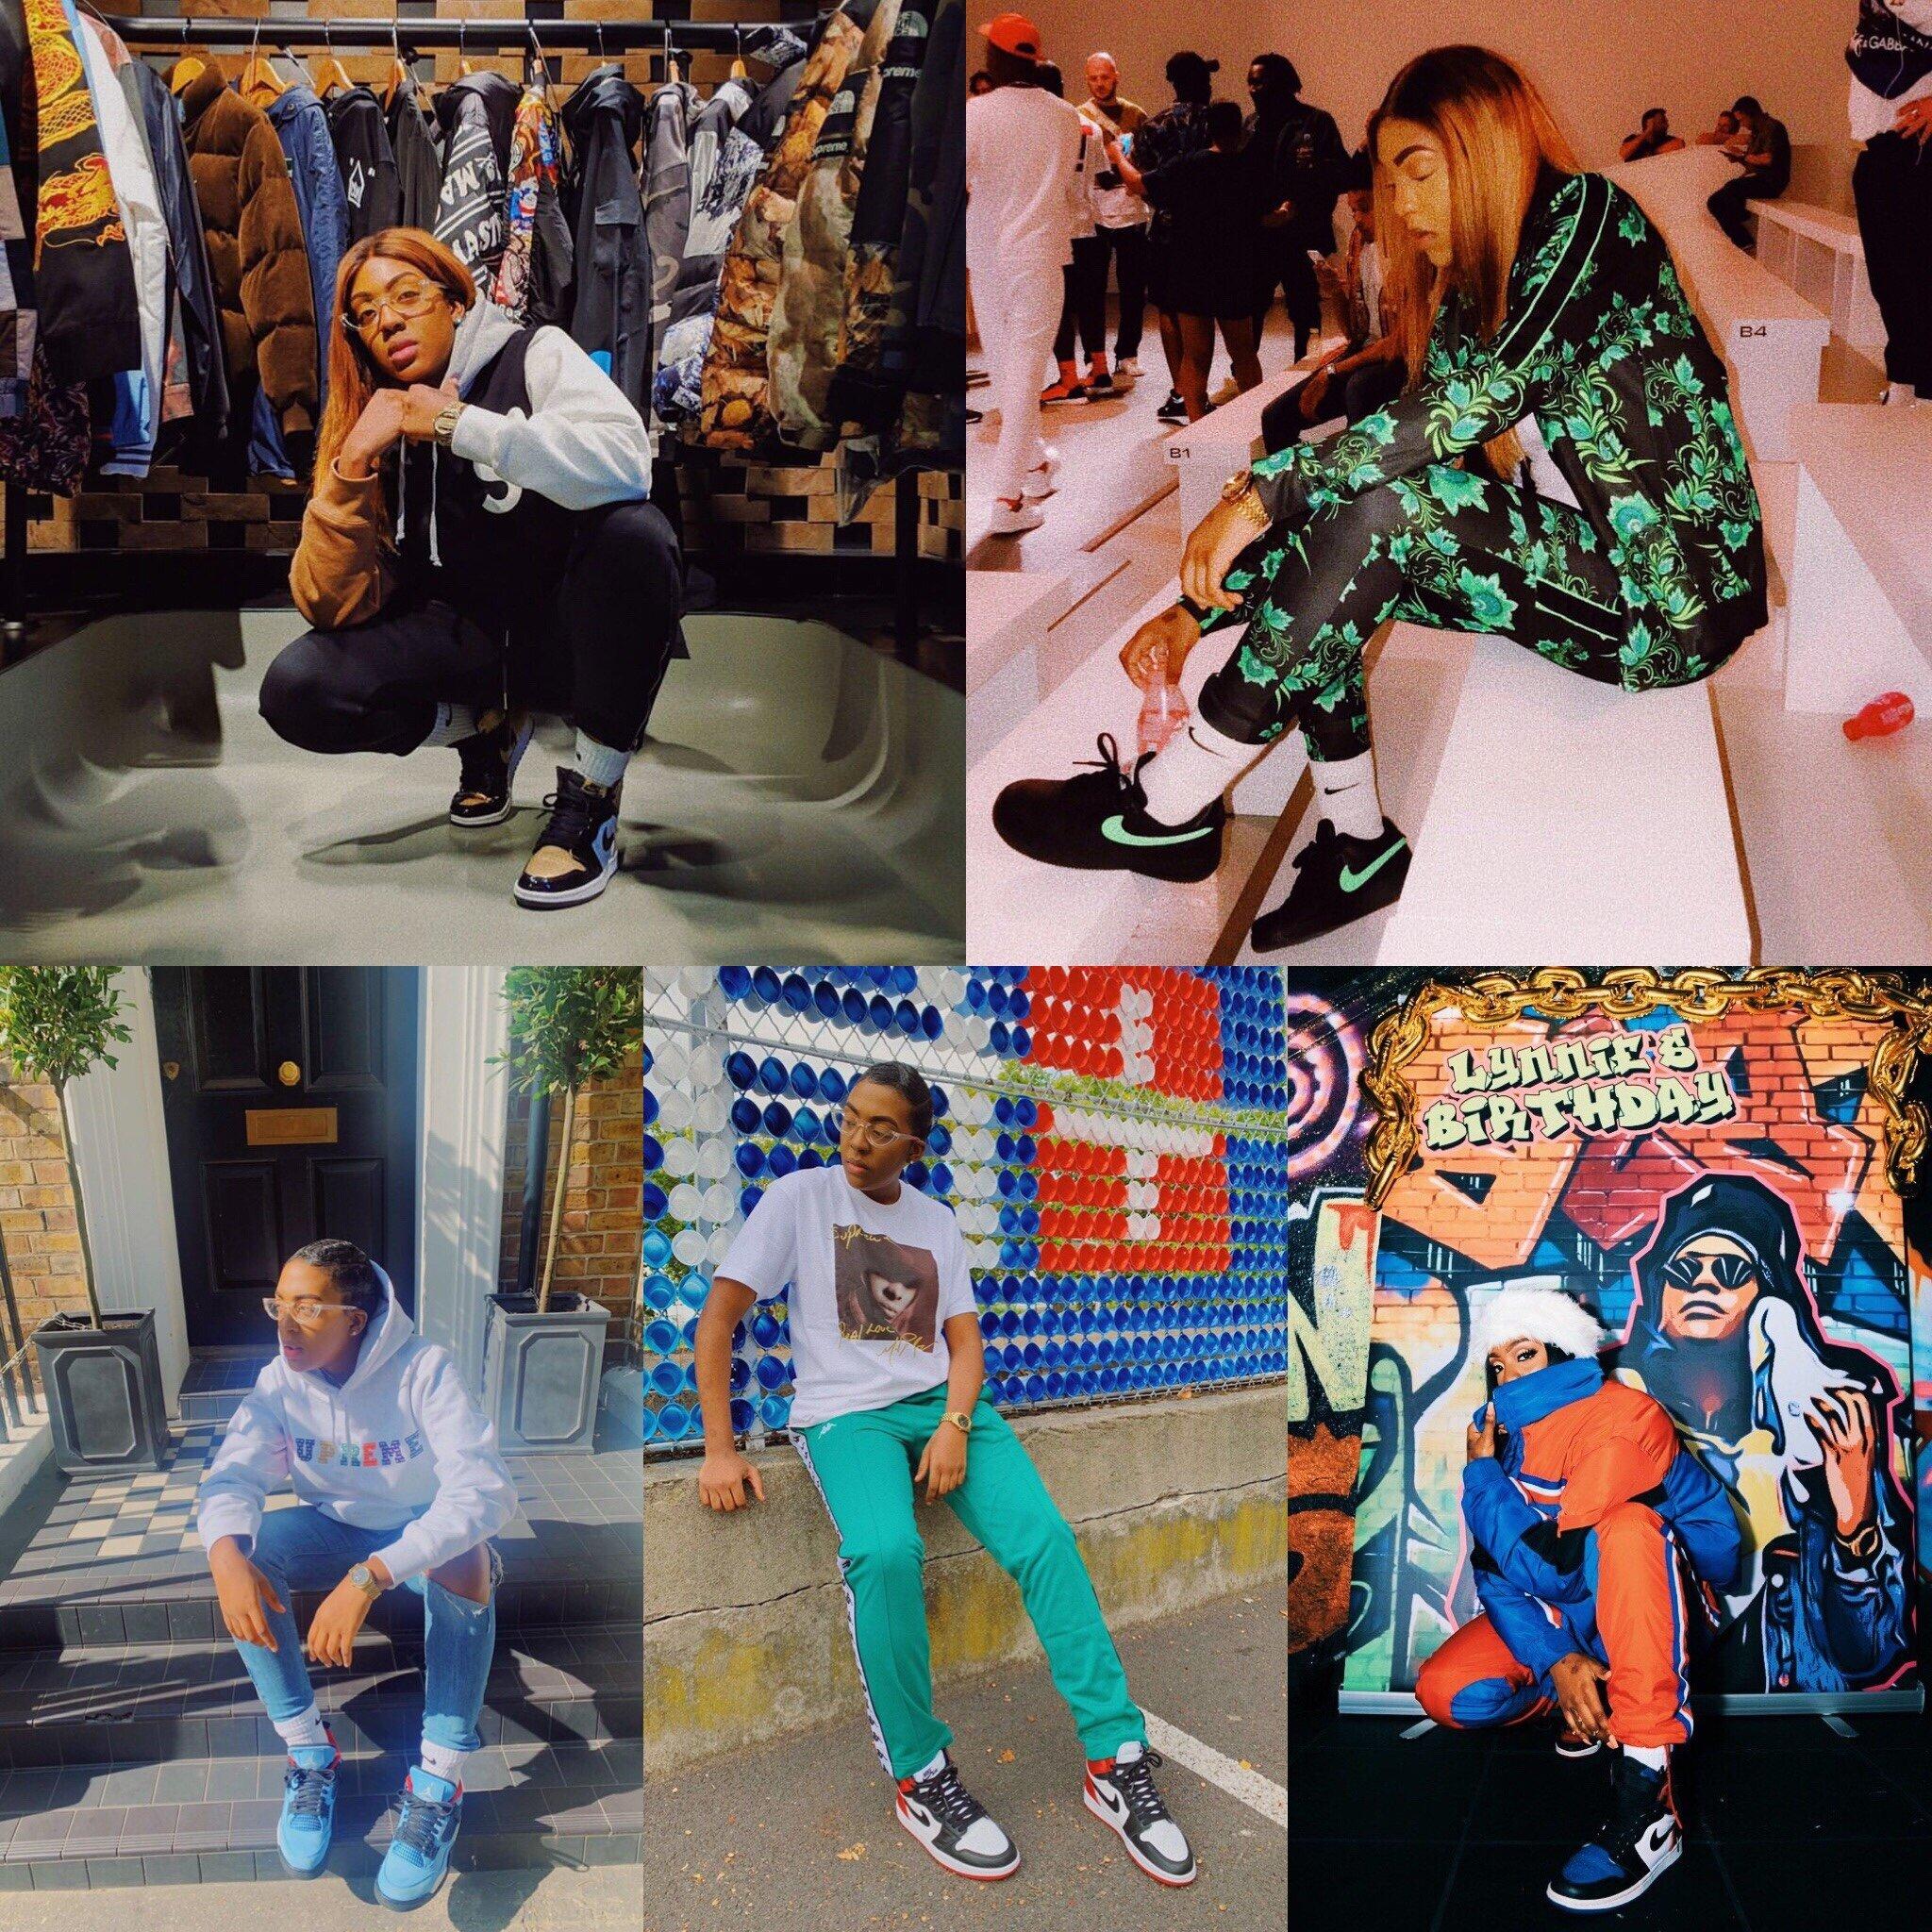 Elle Sneaks reppin' all the latest heat! Top Left : AJ1 Gold Toe, AF1 low, AJ 4 Cactus, AJ 1 Satin, AJ 1 Top 3 Photo Credit: Elle Sneaks Instagram page